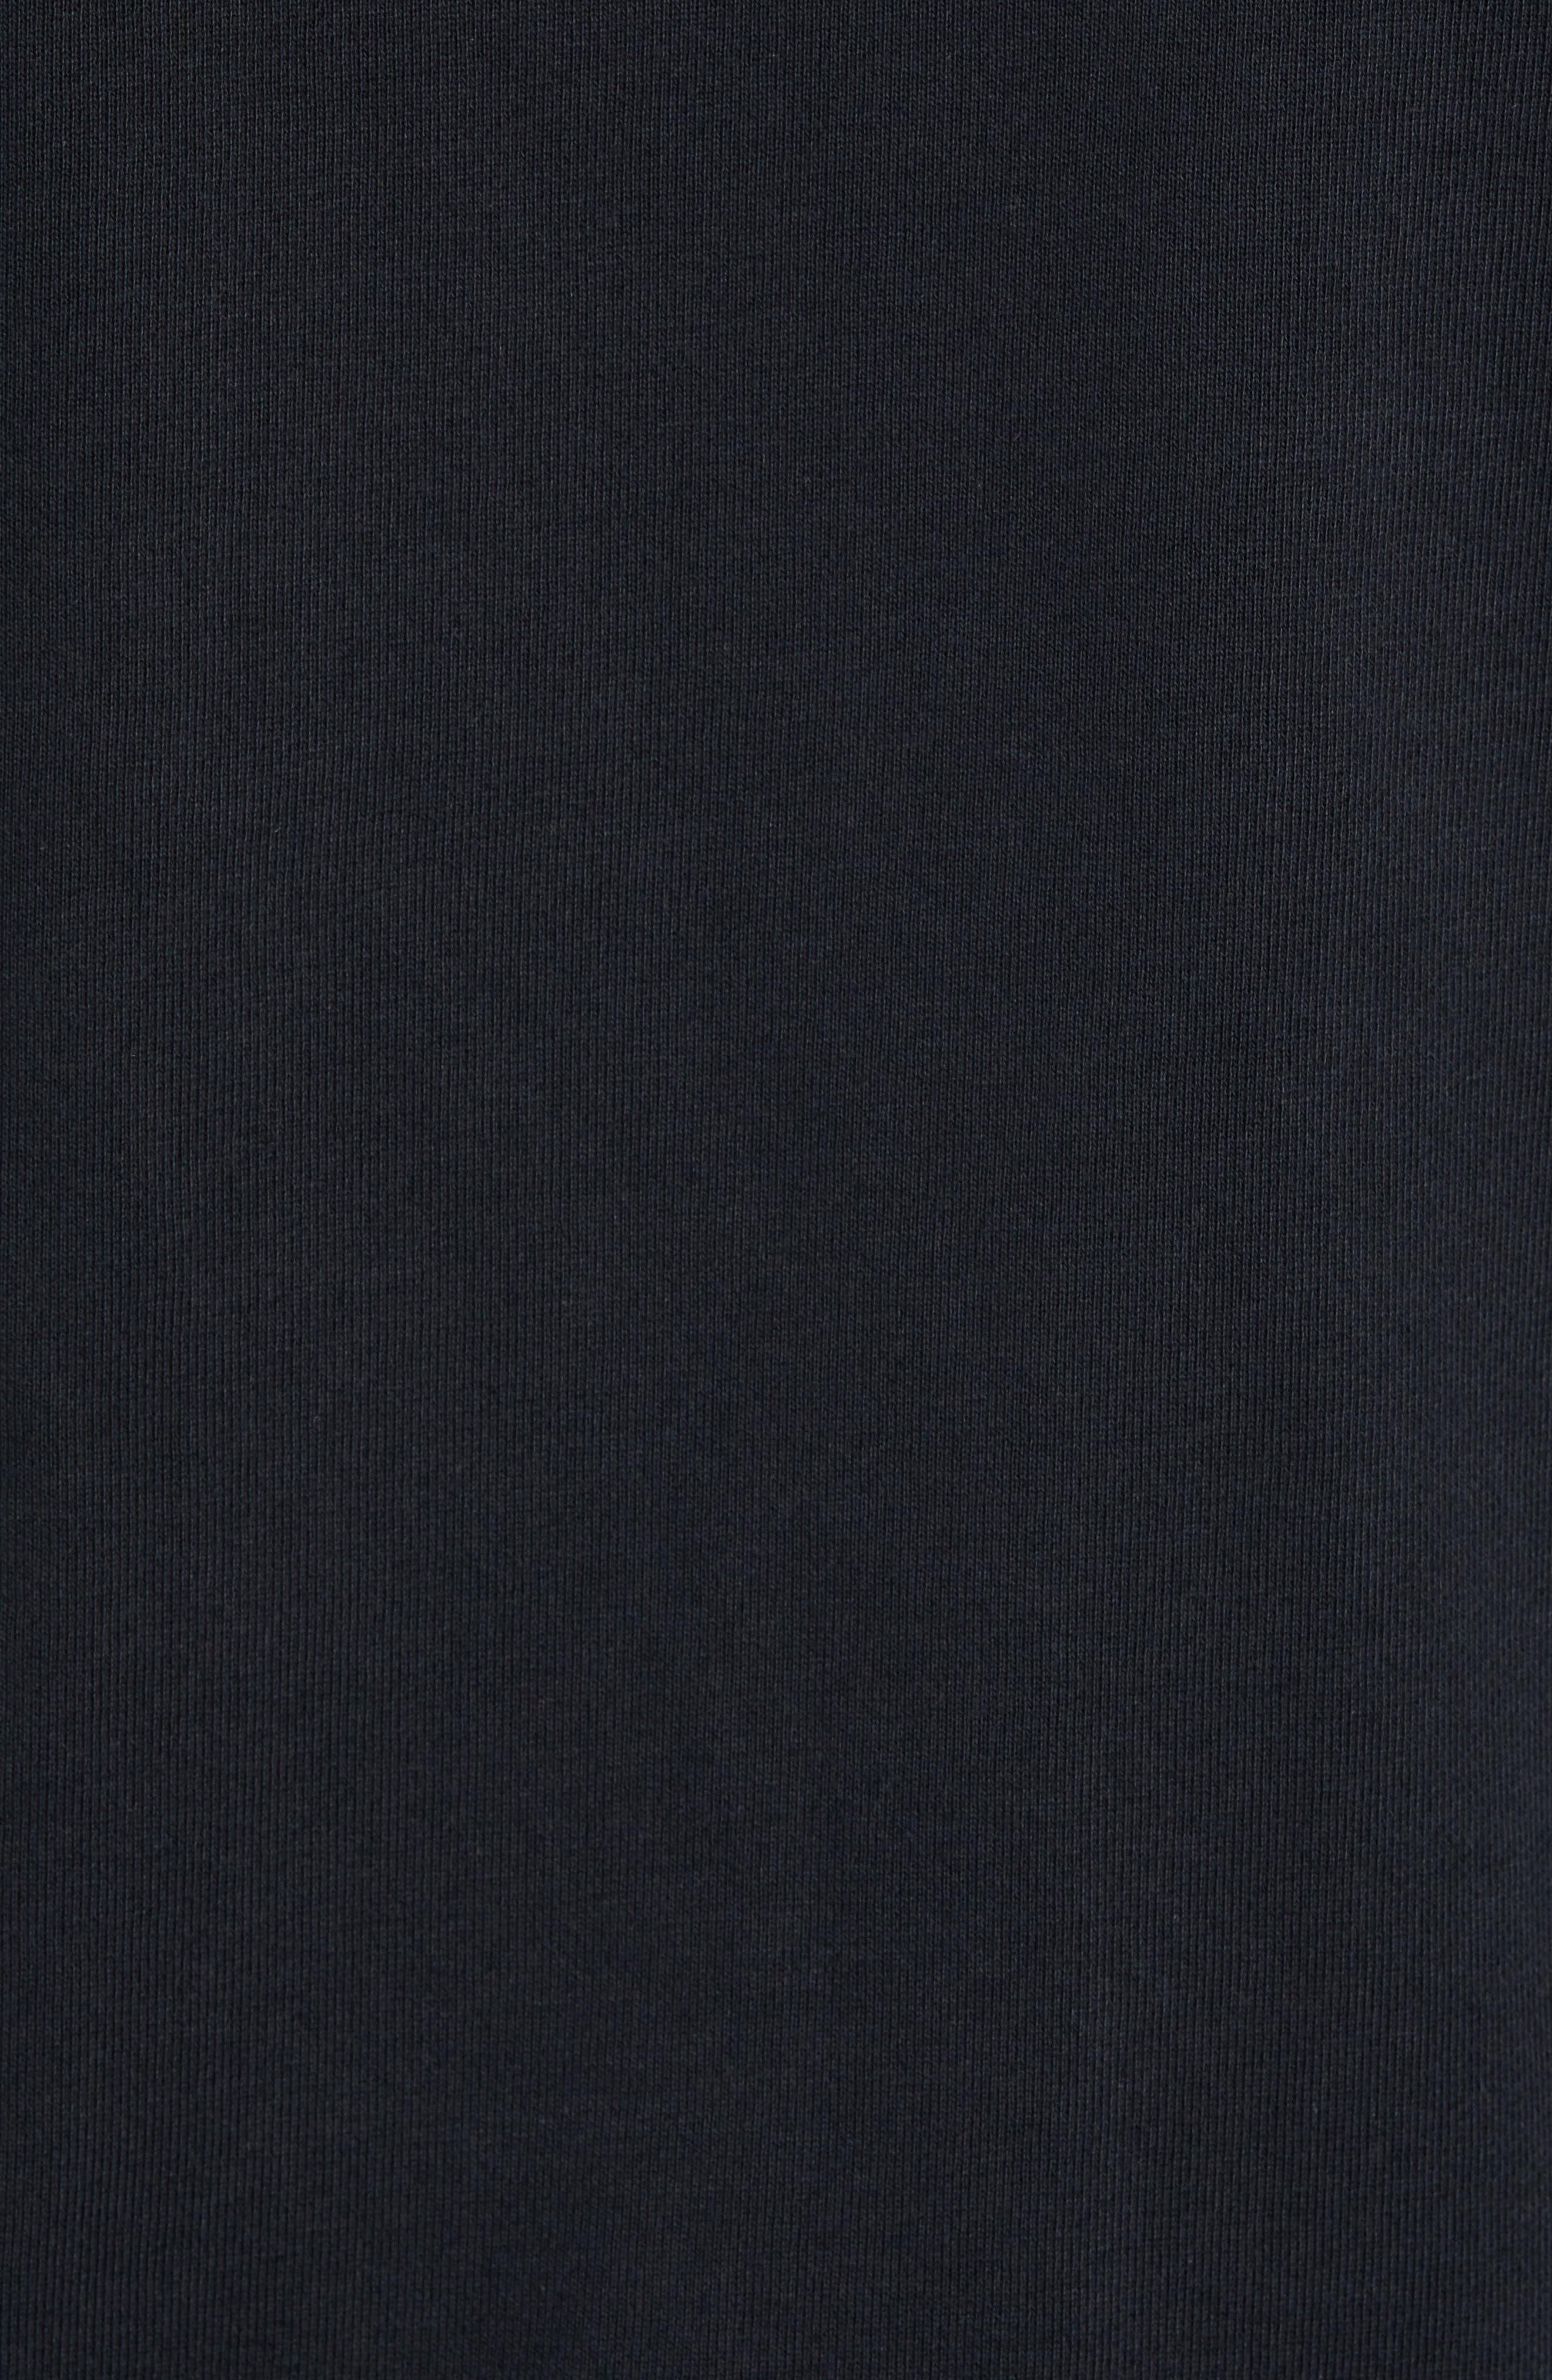 Sportswear ACG Pullover Hoodie,                             Alternate thumbnail 5, color,                             BLACK/ BLACK